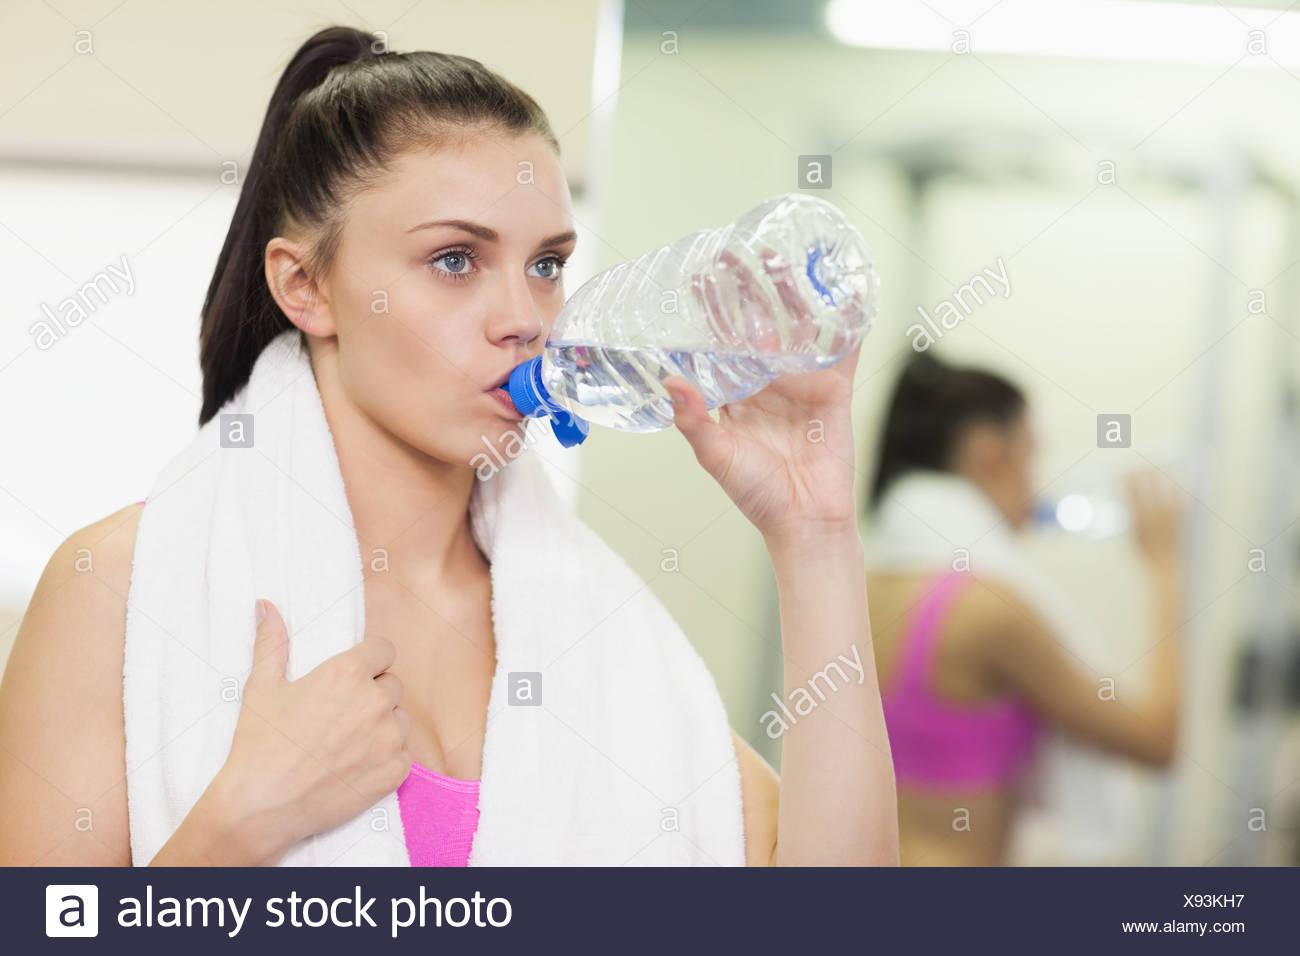 Nahaufnahme einer Frau Trinkwassers im Fitness-Studio Stockbild